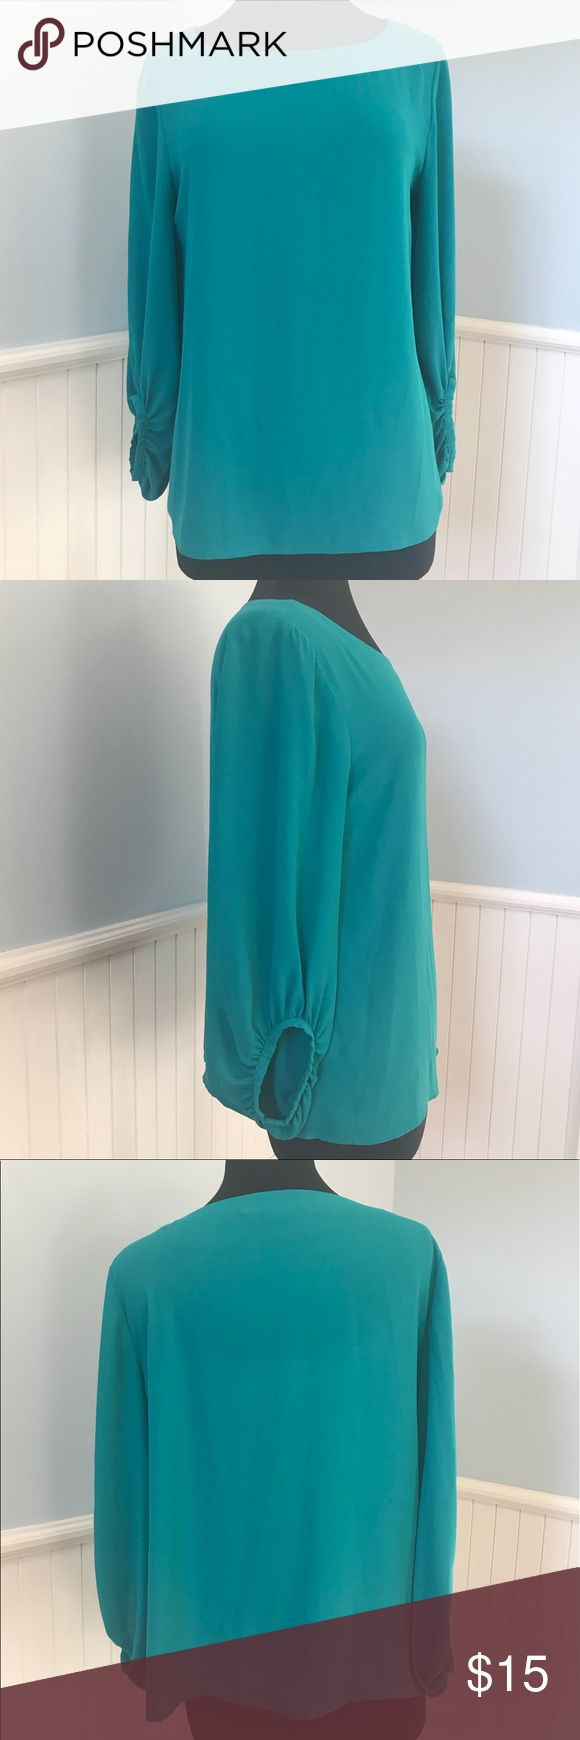 Ann Taylor Loft Teal Blouse size Medium Gorgeous teal color with blouson sleeves  Size Medium Ann Taylor Tops Blouses